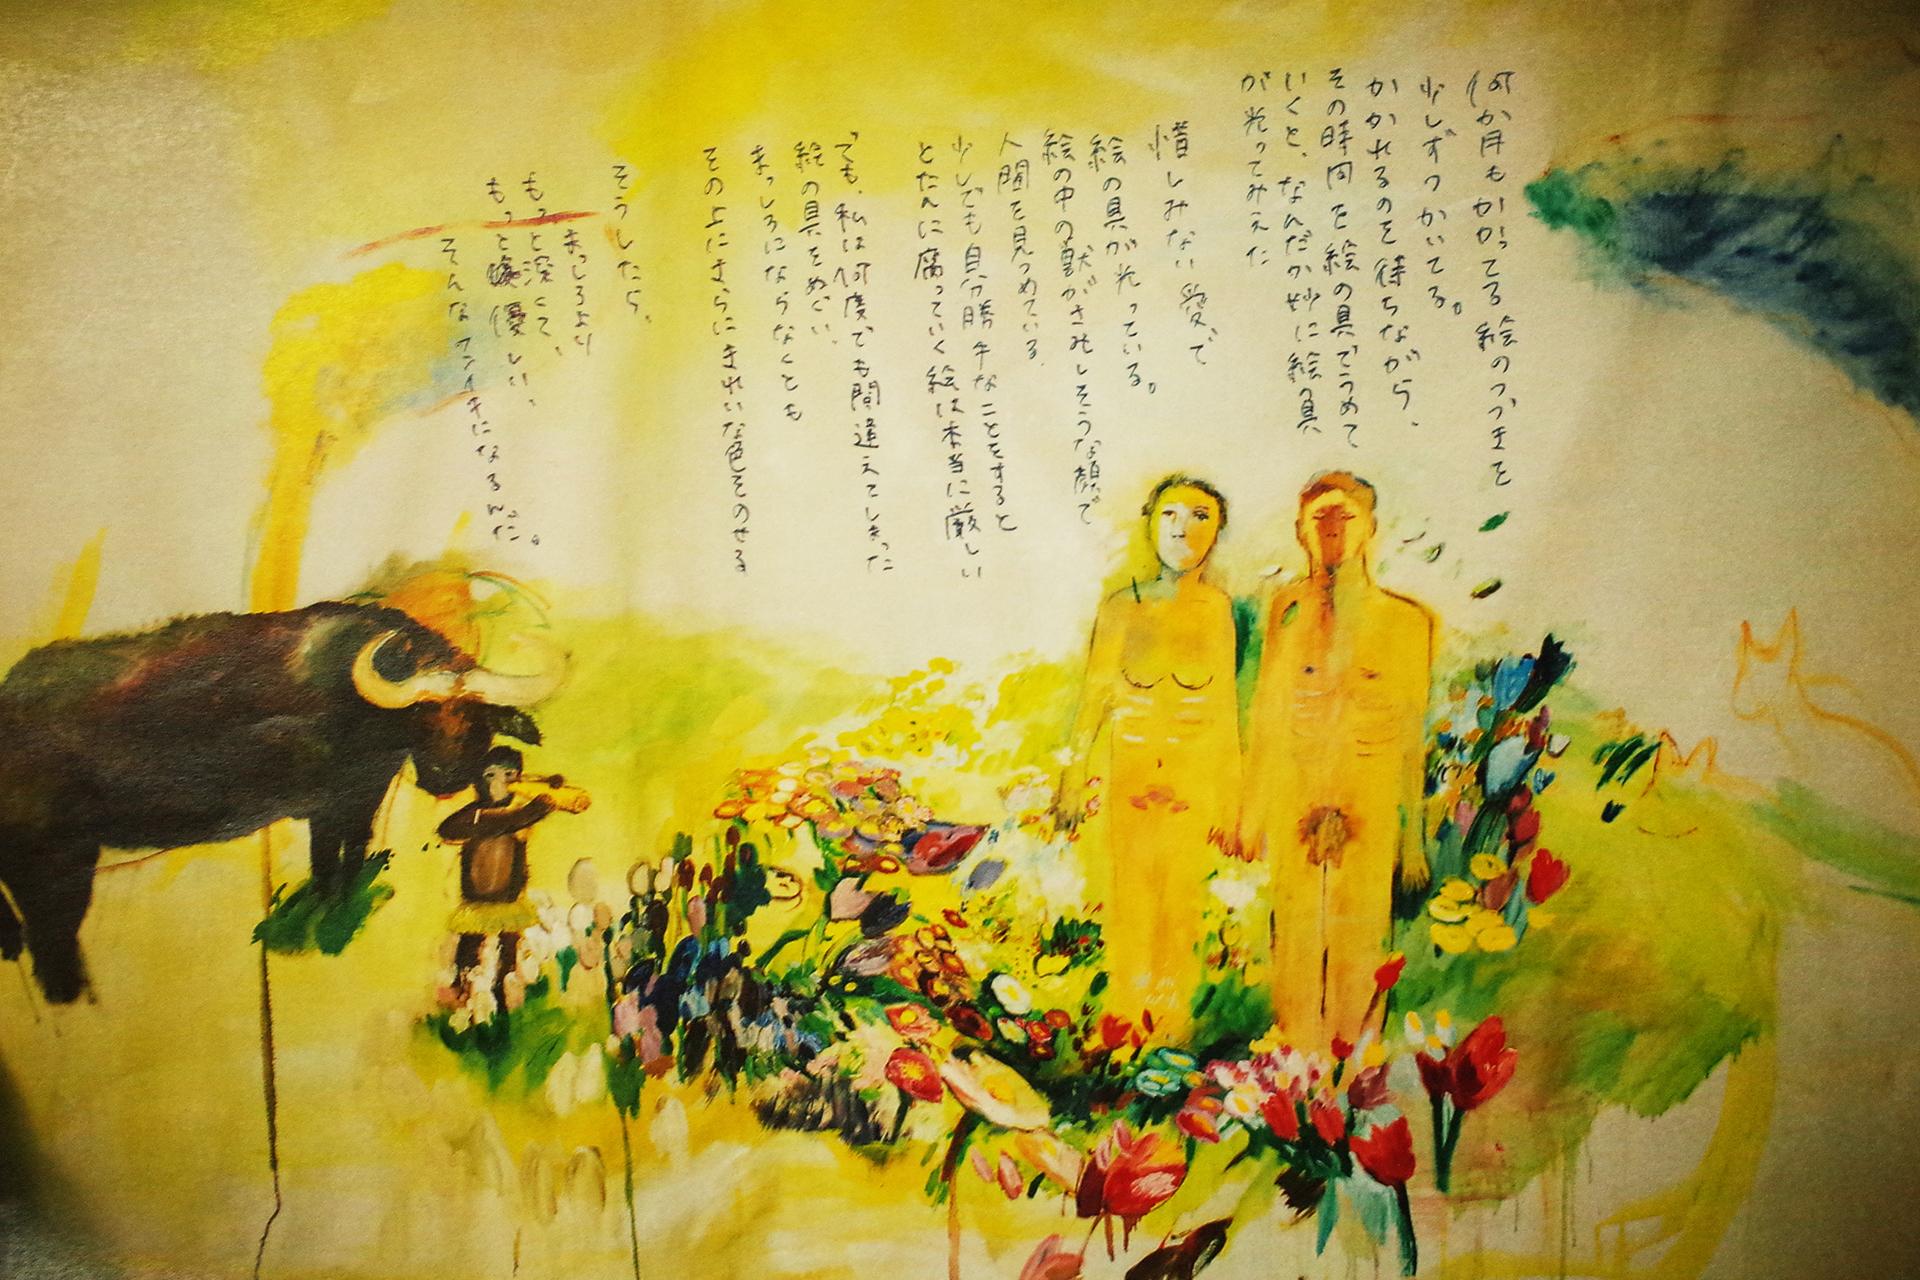 相澤 義和 | Aizawa Yoshikazu